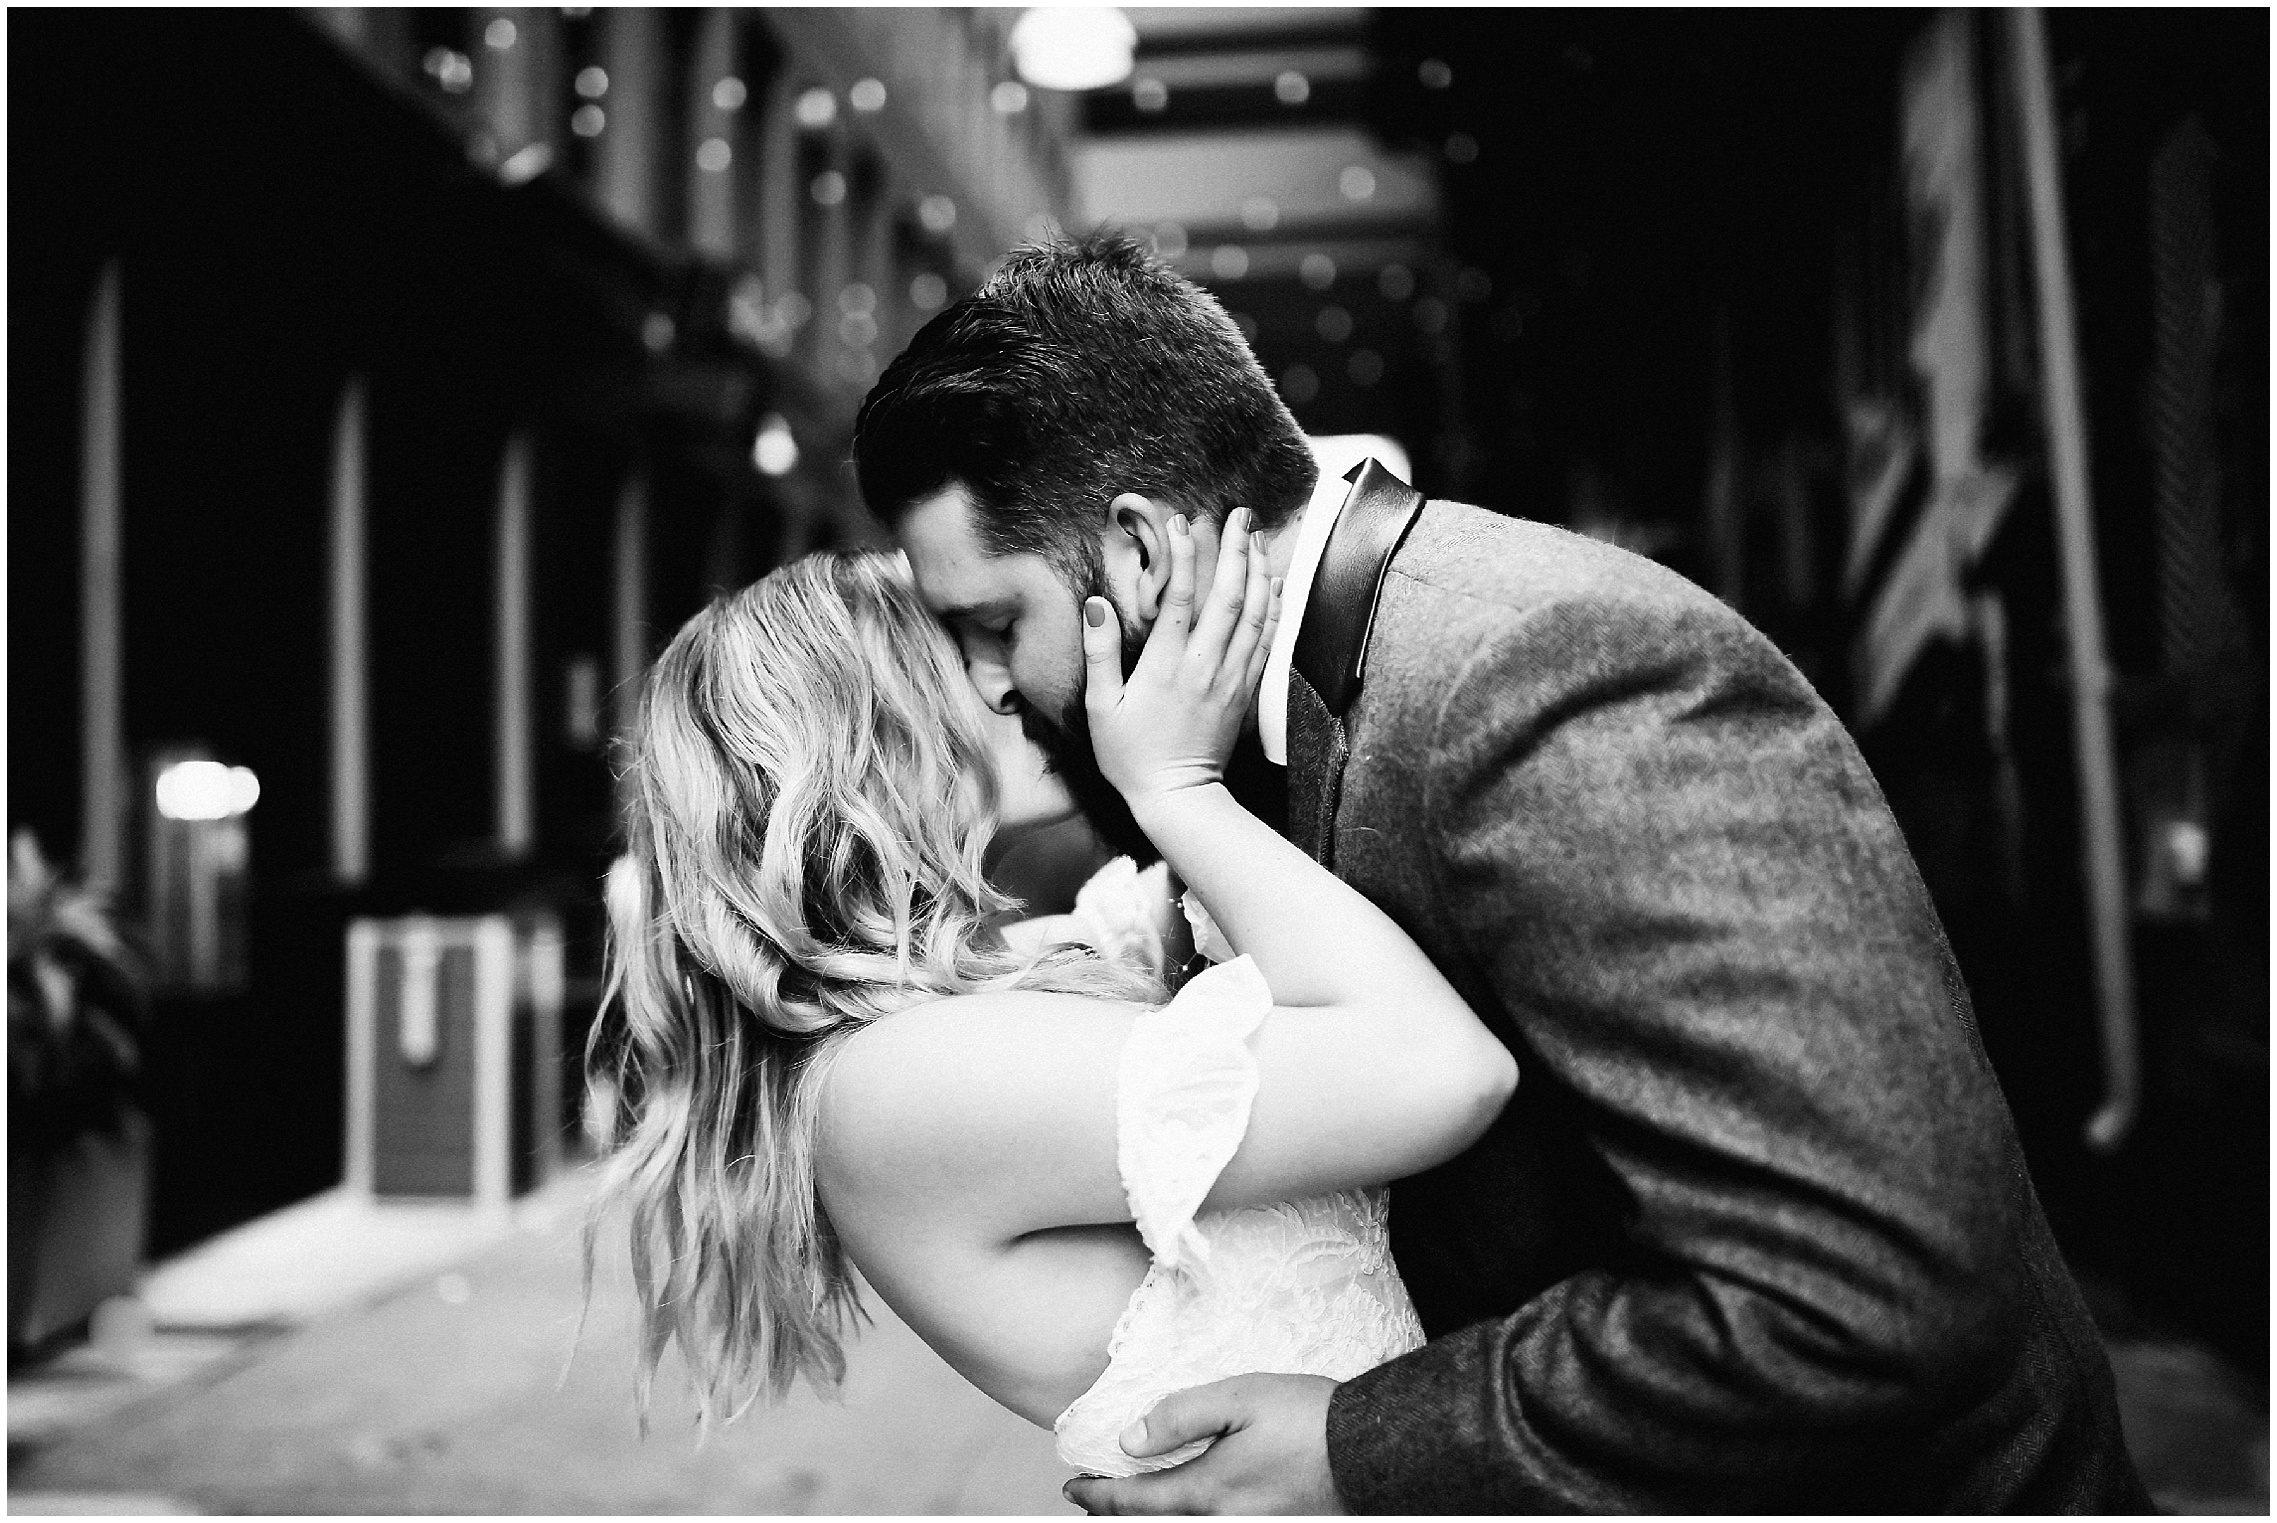 brick_and_mortar_colorado_wedding_photographer_0240.jpg